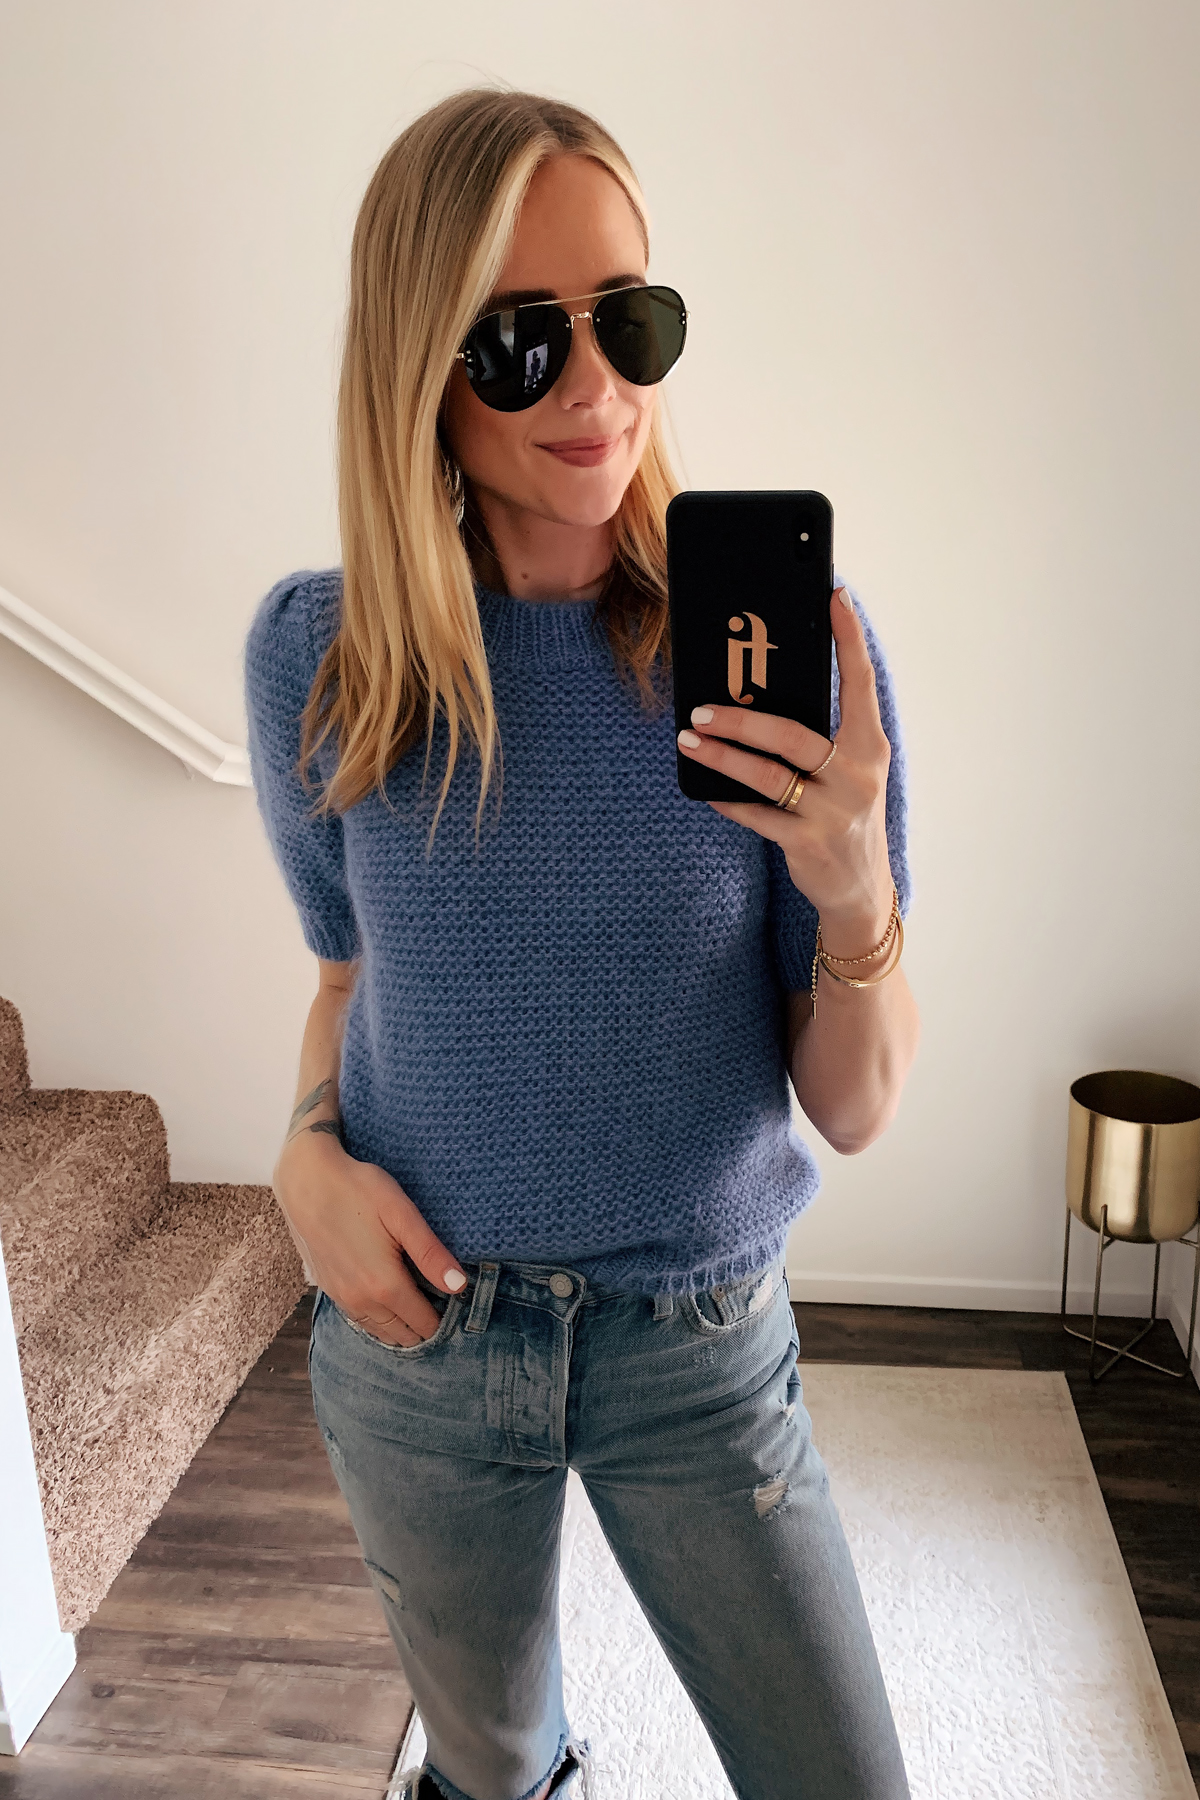 Fashion Jackson Wearing Celine Aviator Sunglasses Anine Bing Blue Sweater Ripped Jeans